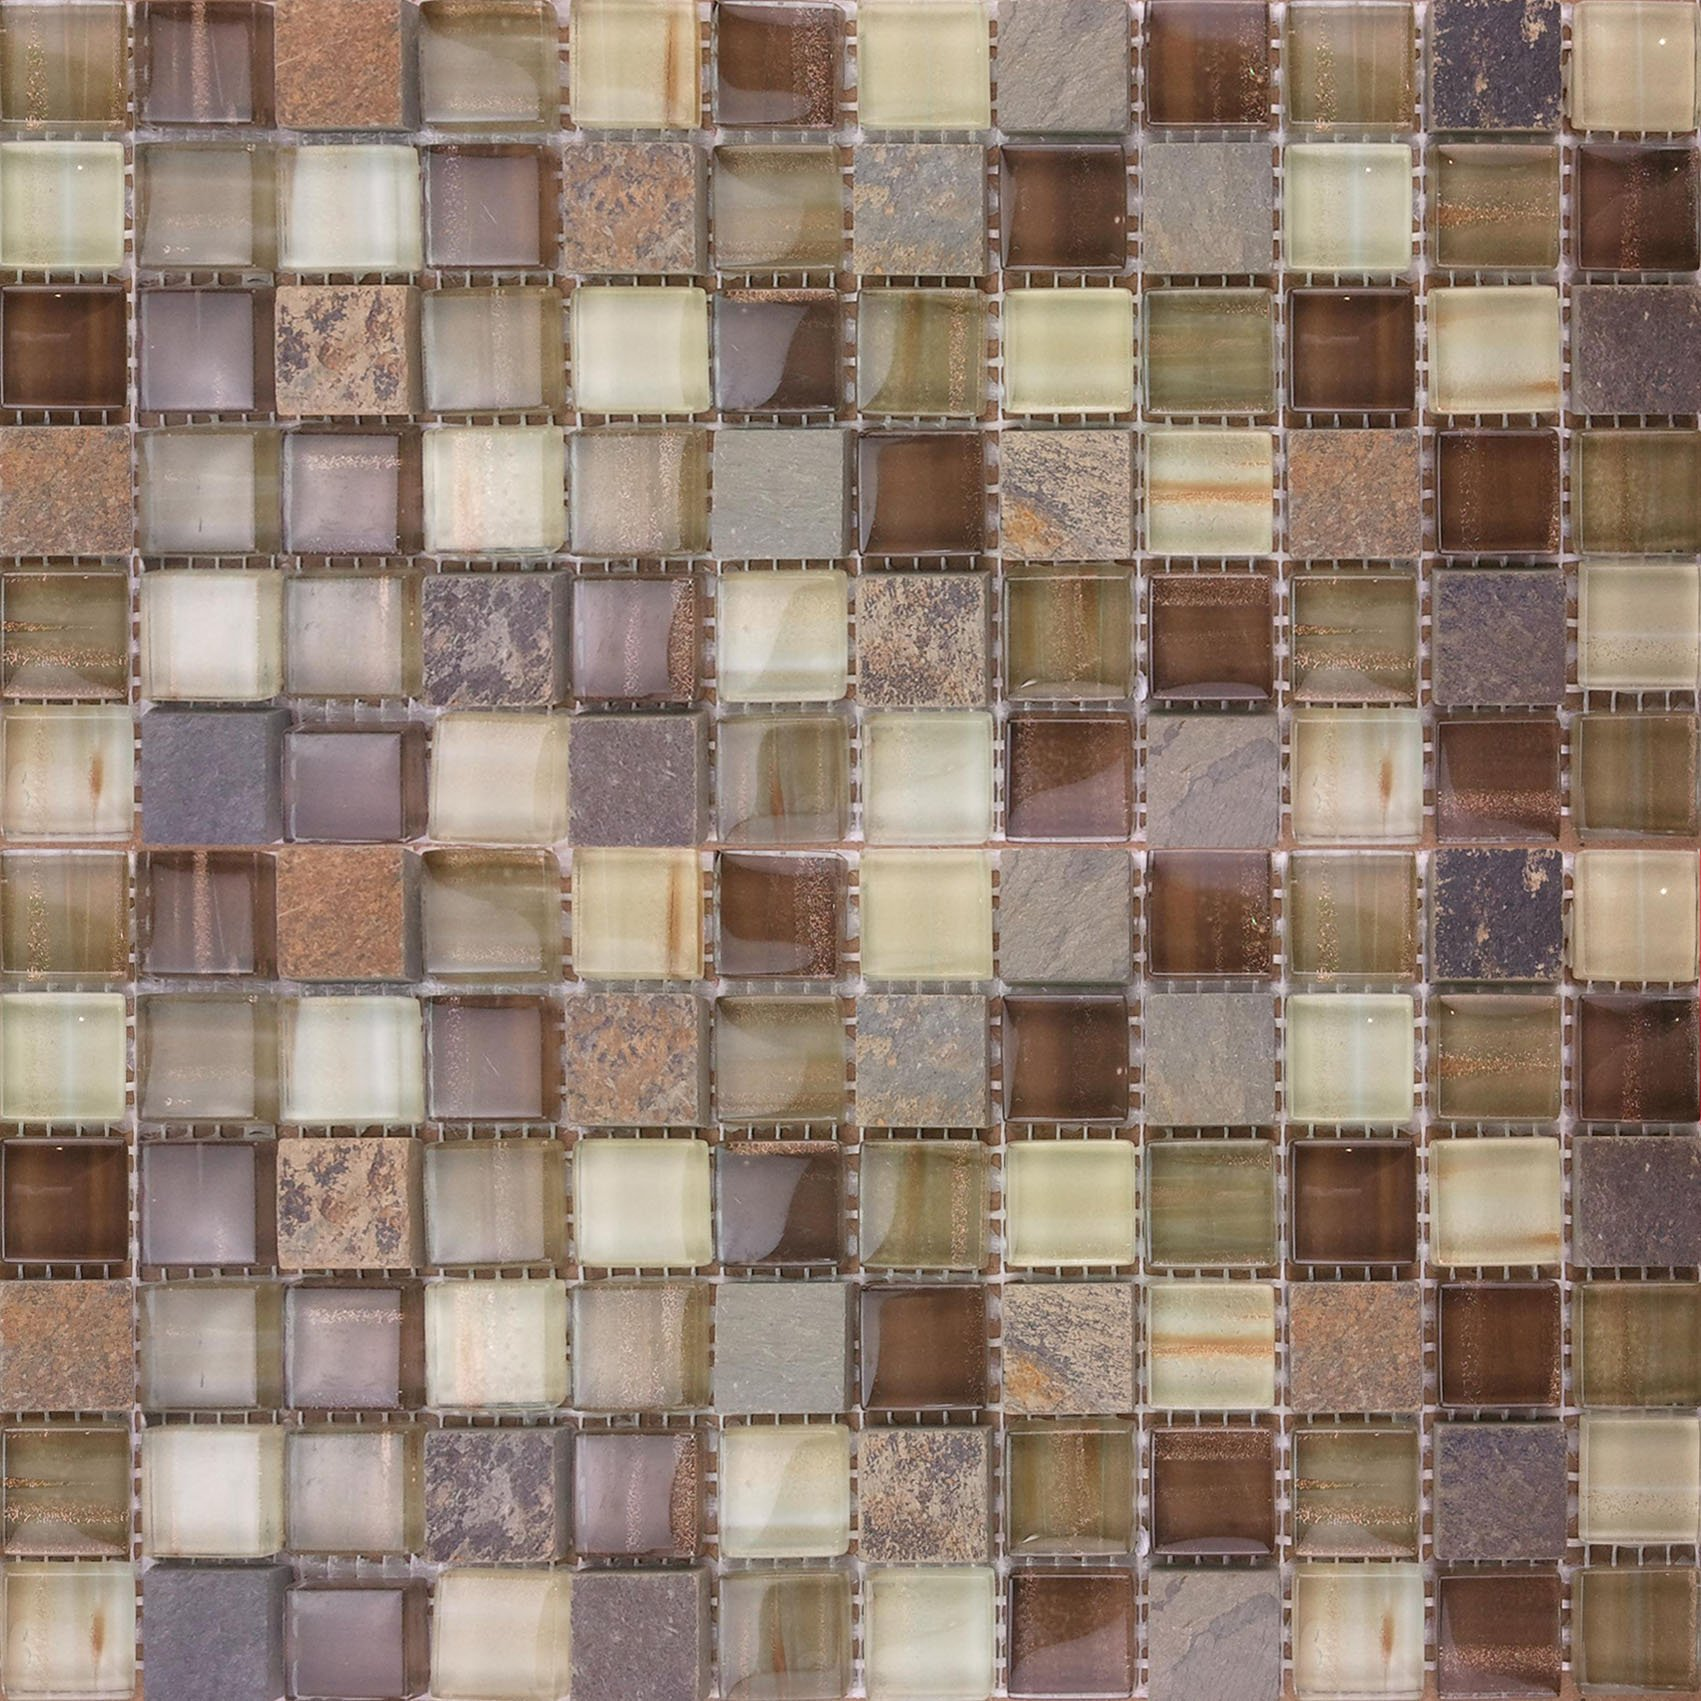 Glass Stone Mosaic Tile Backsplash - 11.40''x11.40'' RioLite - Kitchen Bath Wall by Crystalcor USA